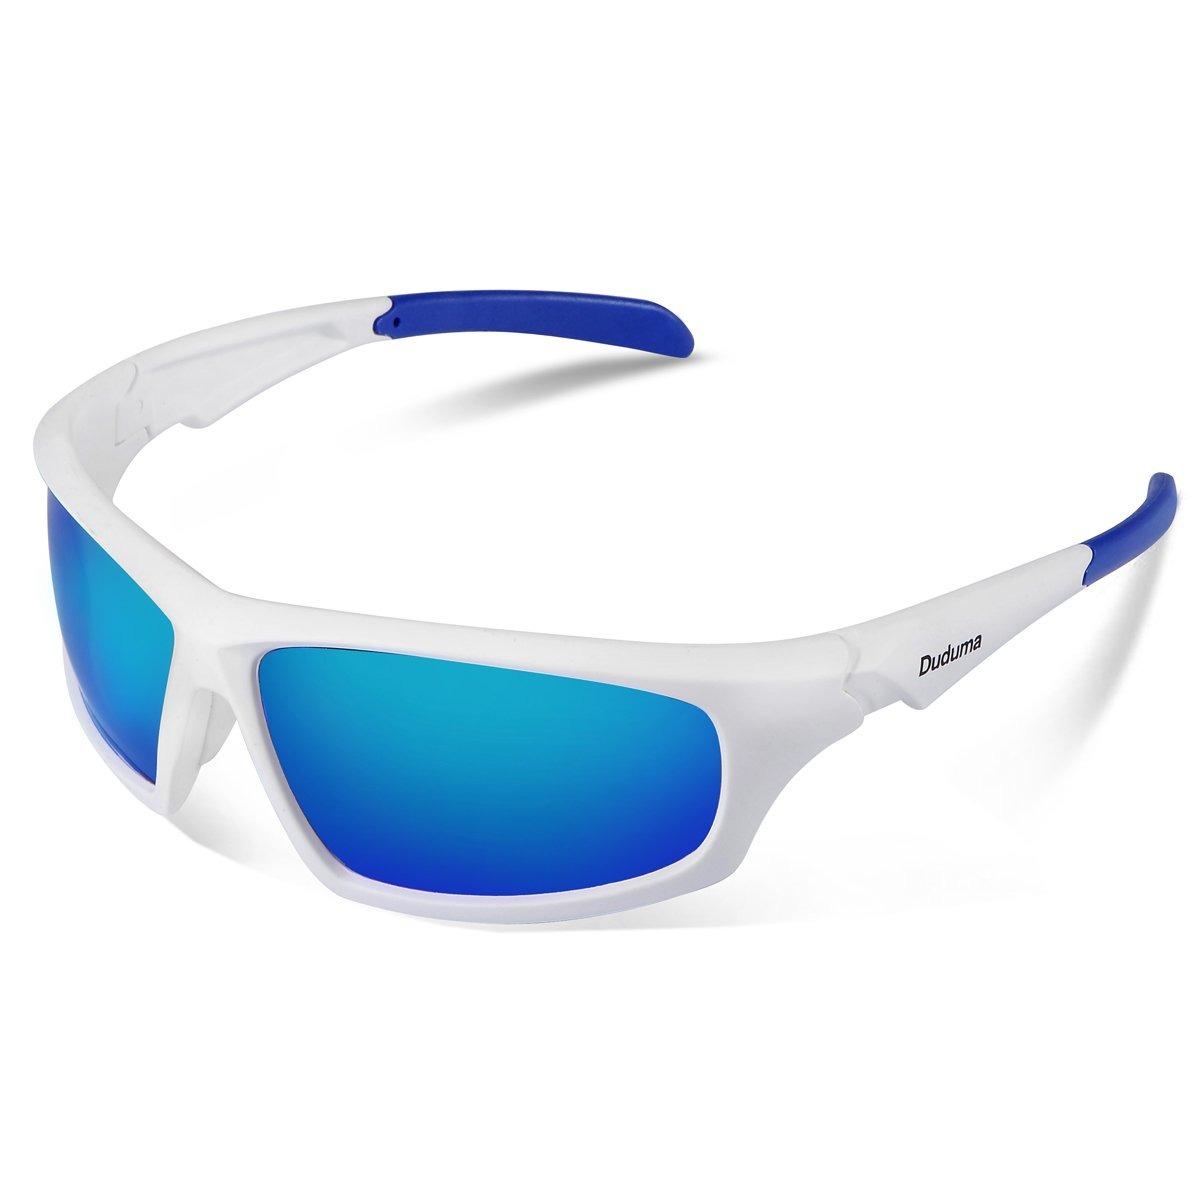 738aa9c905950 duduma tr601 gafas de sol deportivas polarizadas para béi. Cargando zoom.